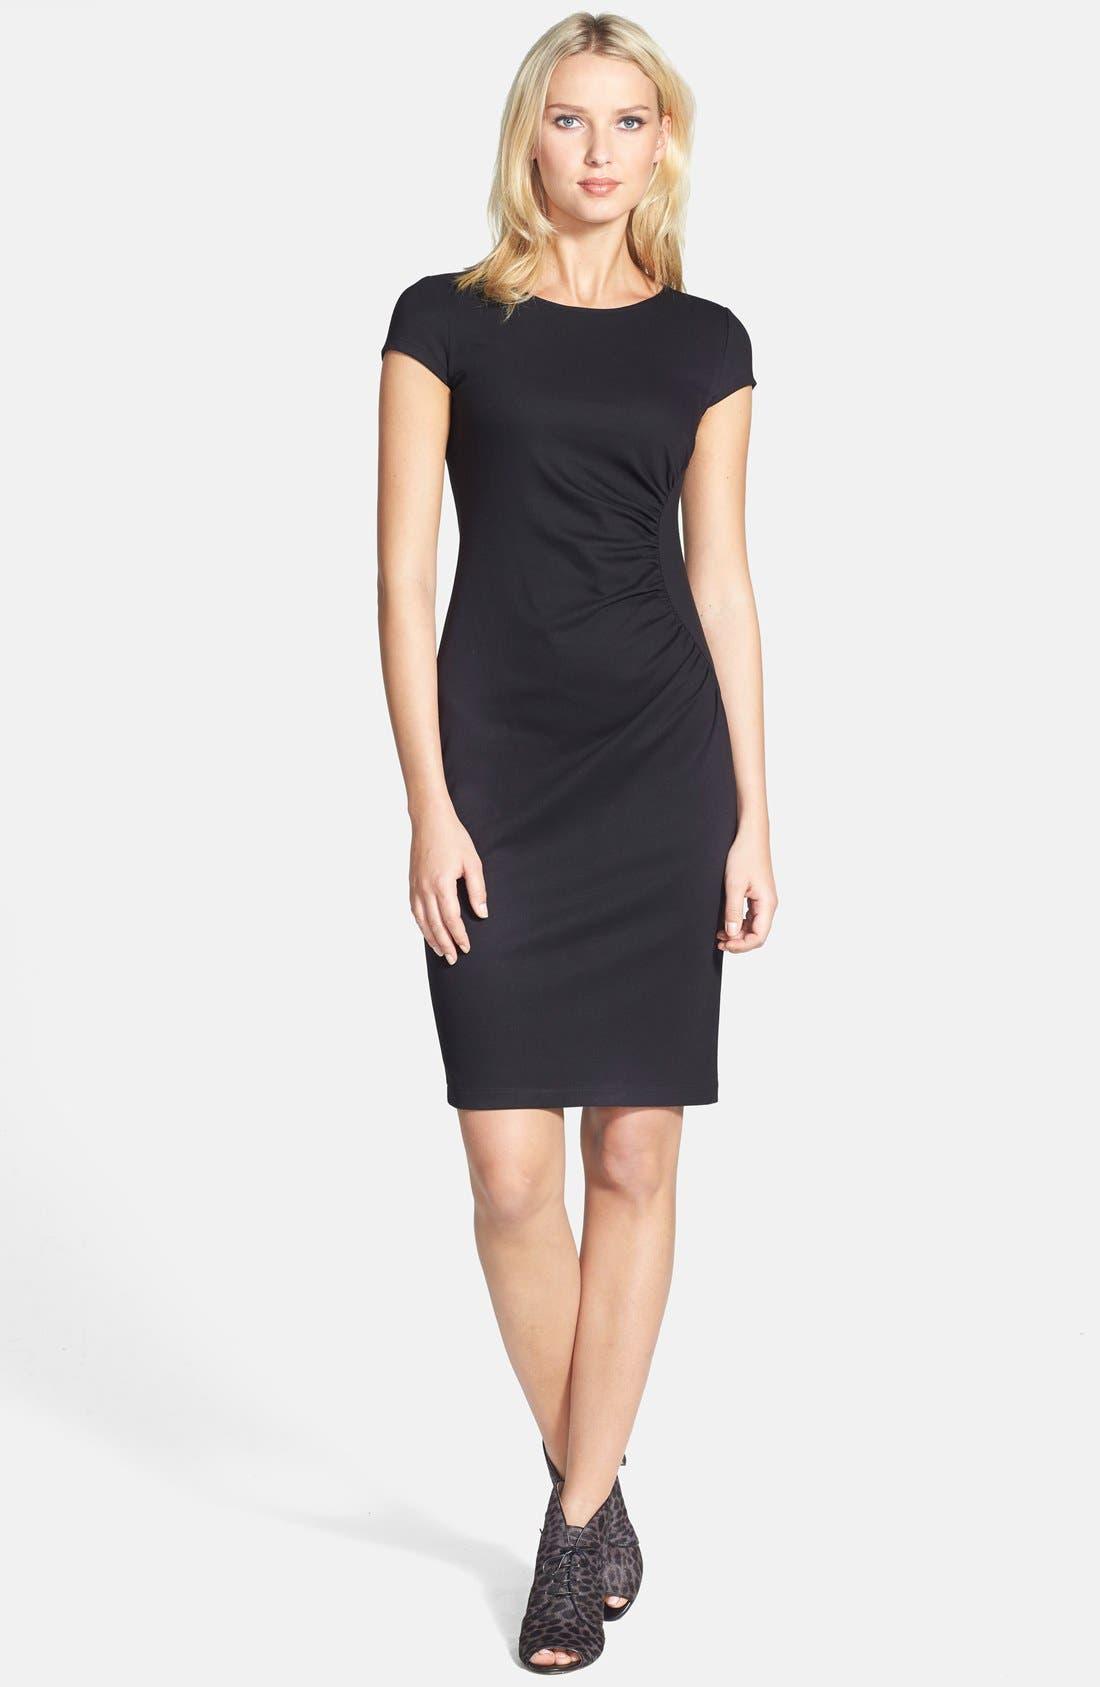 Alternate Image 1 Selected - Lafayette 148 New York Cap Sleeve Shirred Side Dress (Regular & Petite)